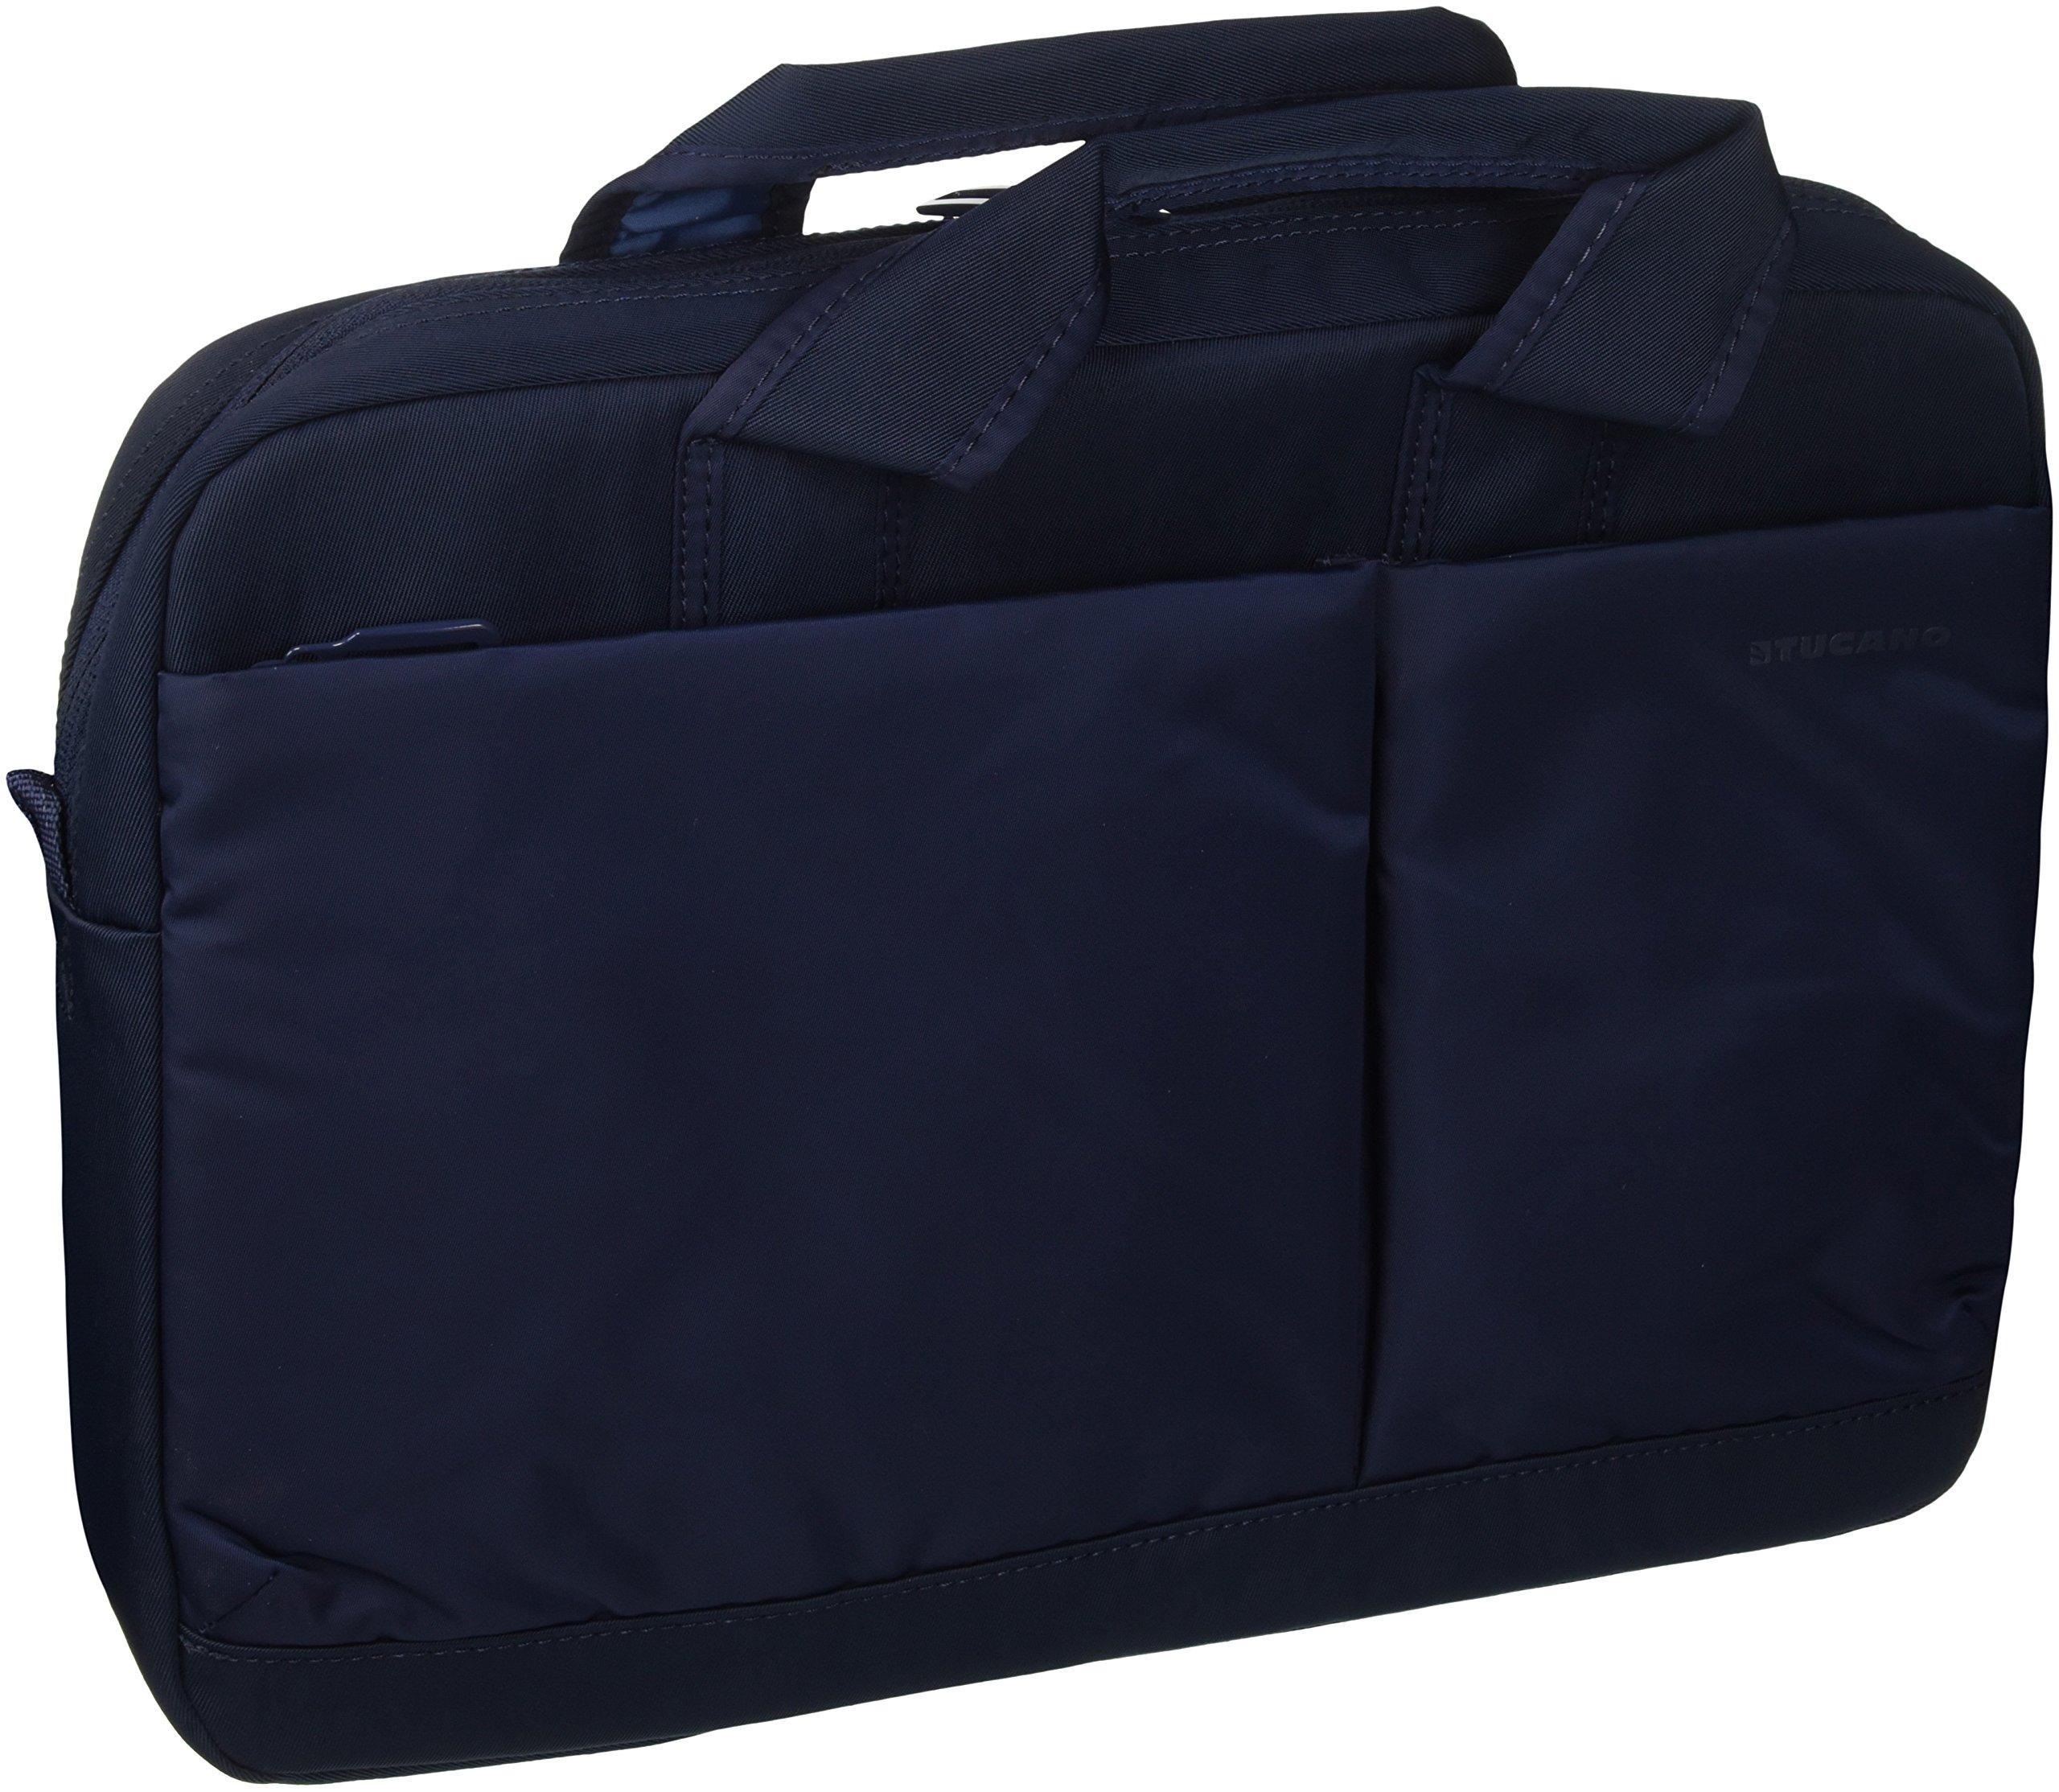 Tucano BPB1314-B Laptop Computer Bags & Cases